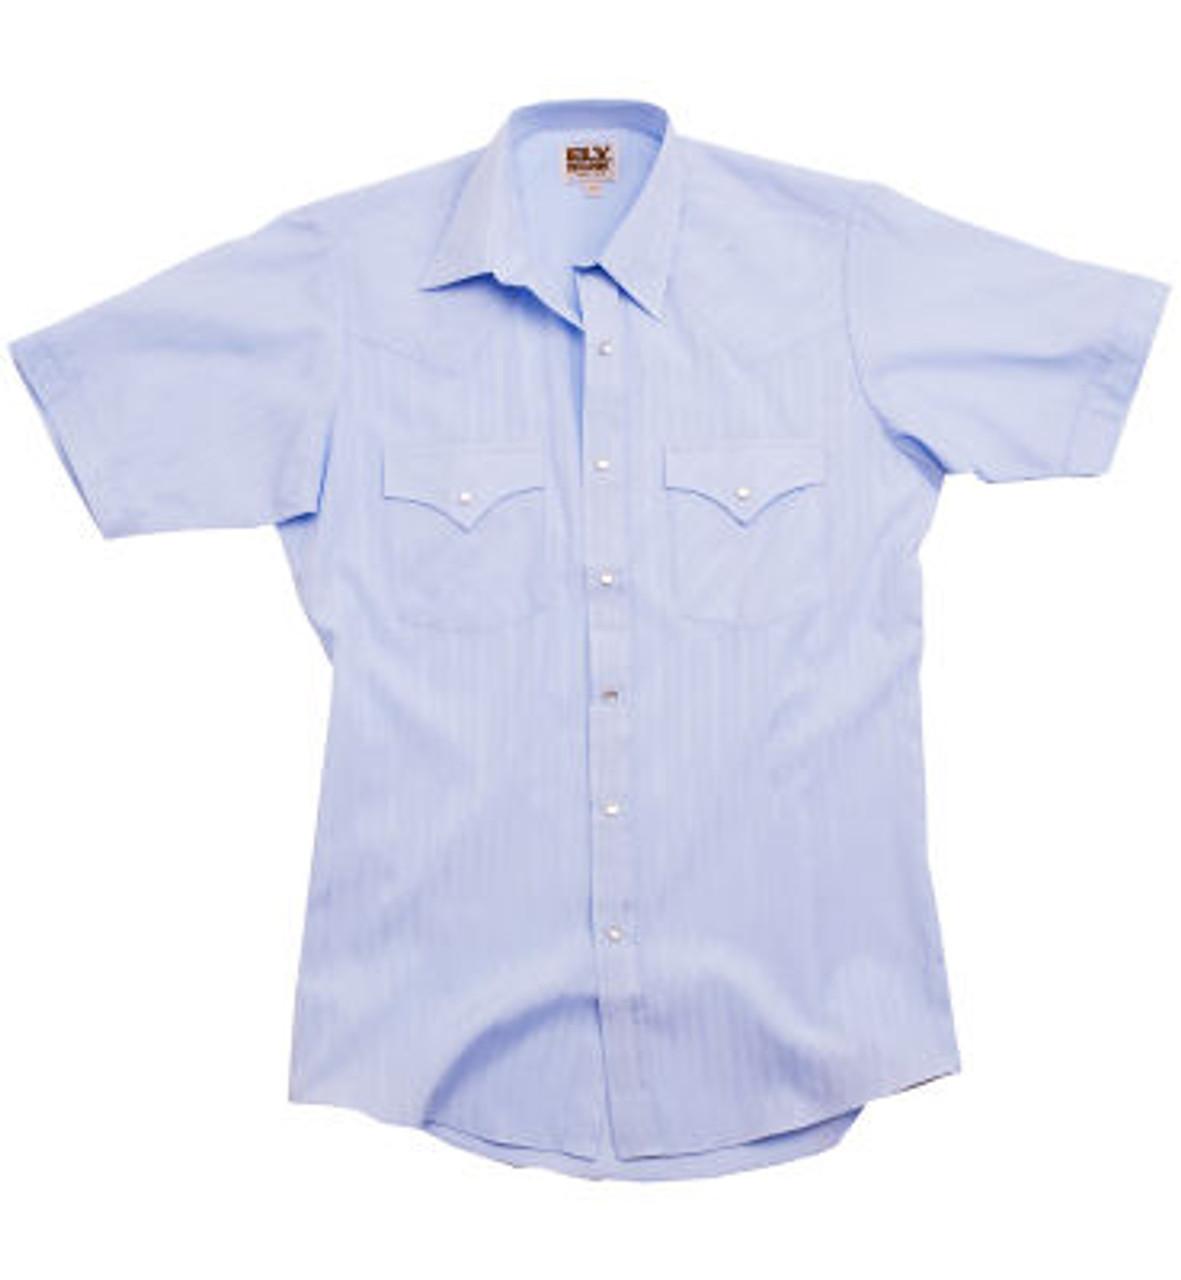 Western themed short sleeve uniform shirt!